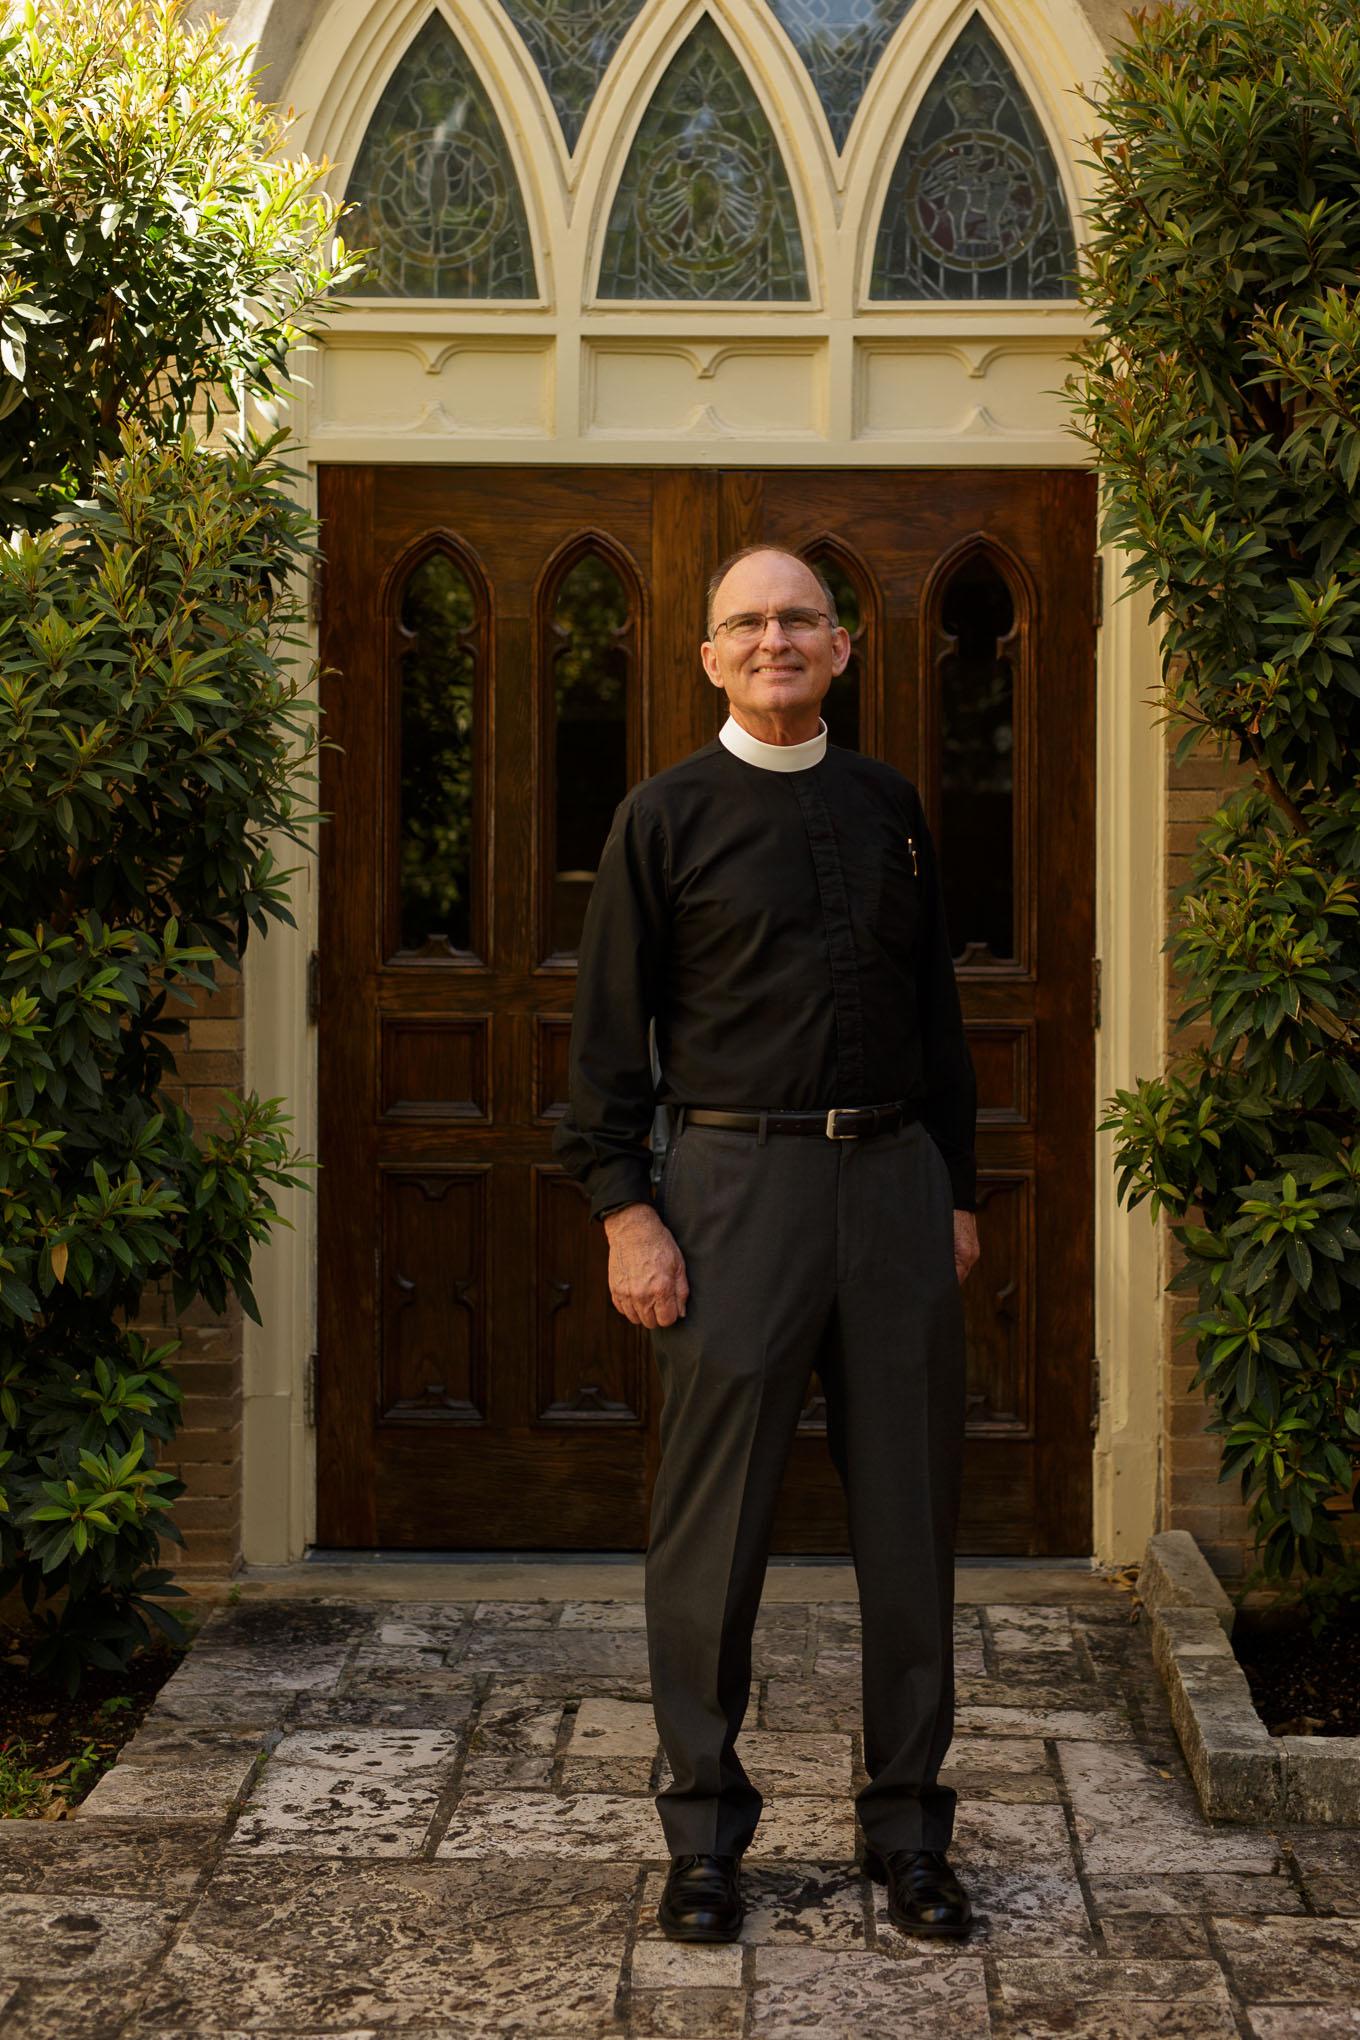 Rector Patrick Gahan of Christ Episcopal Church. Photo by Scott Ball.